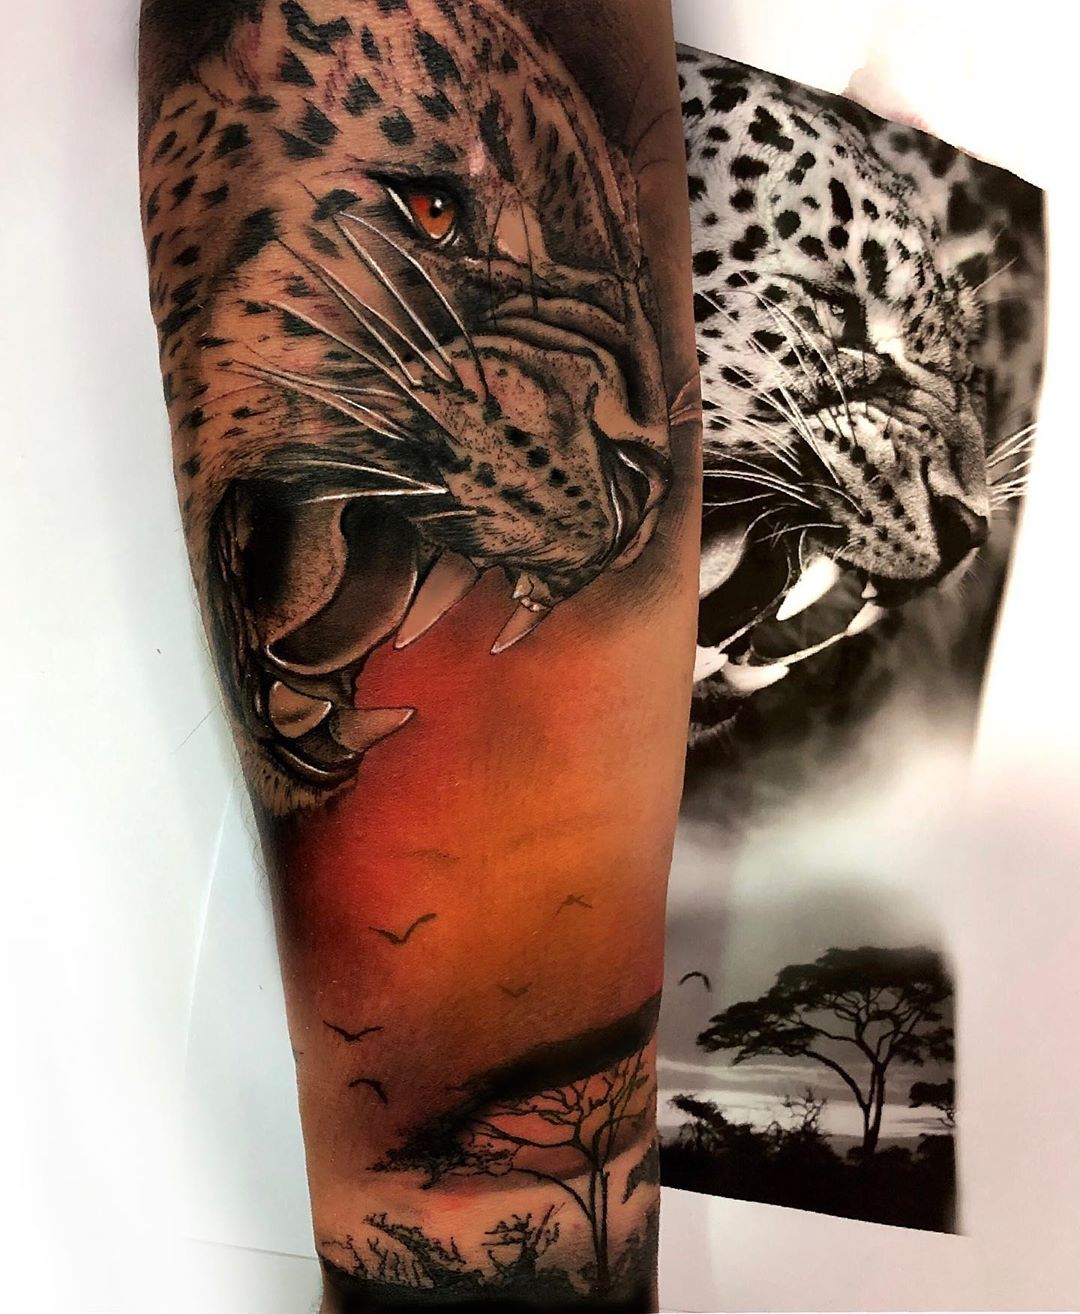 followforfollow,berlin,followmeciudadreal,ciudadreal,tomelloso,almagro,puertollano,tatuajesenpuertollano,tatuajesendaimiel,ciudadrealtattoo,ciudadrealtatuajes,tatuajesciudadreal,follow,ciudadrealtatuajes,puertollano,tattooers,besttattooers,juantabasco,ciudadrealsetatua,ink,tatuajes,realismo,realistictattoo,ciudadrealtattoo,tatuajesenpuertollano,traditionaltattoos,castillalamancha